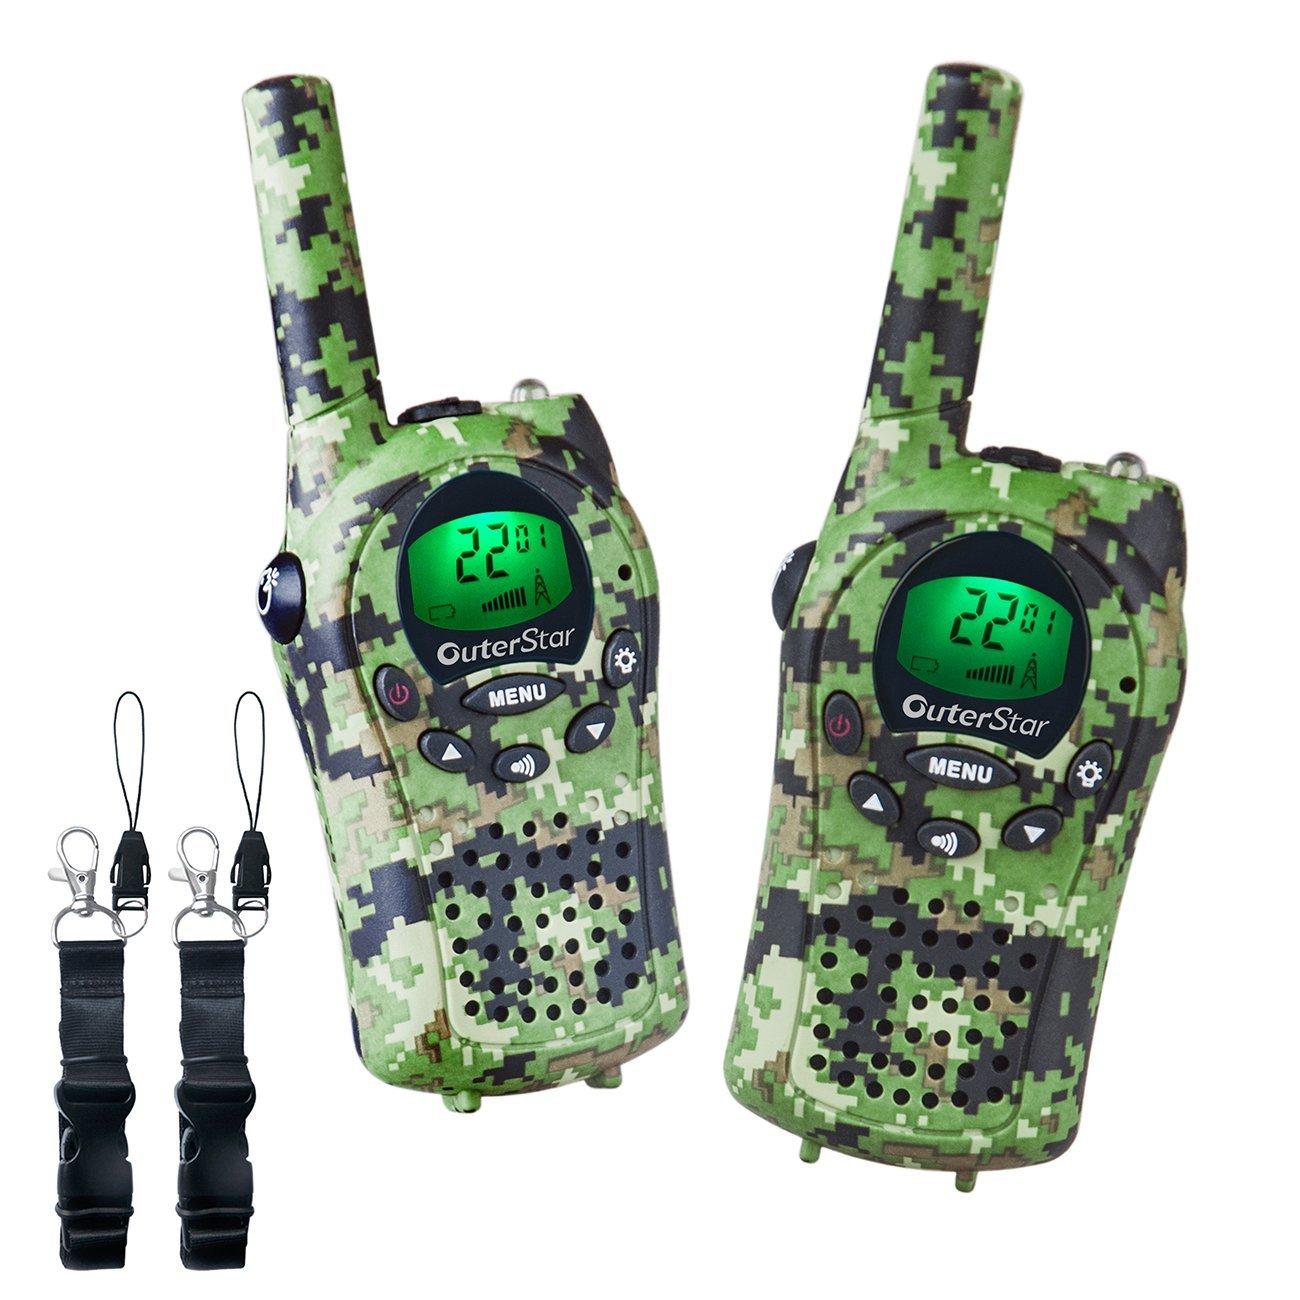 OuterStar Durable Walkie Talkies for Kids, 22 Channel 5KM Long Range (Green Camouflage) $17.93 @ Amazon